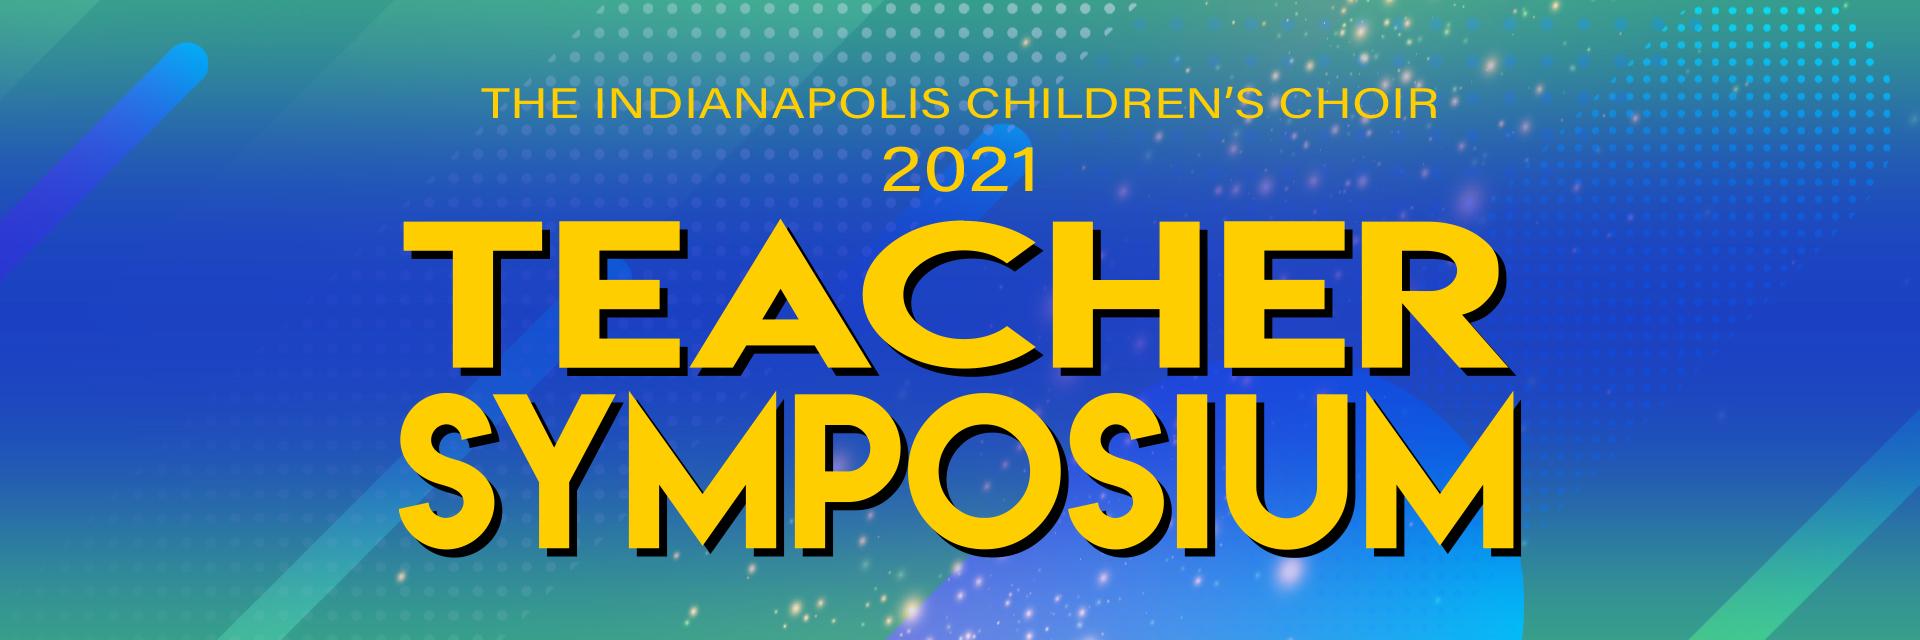 teacher symposium header